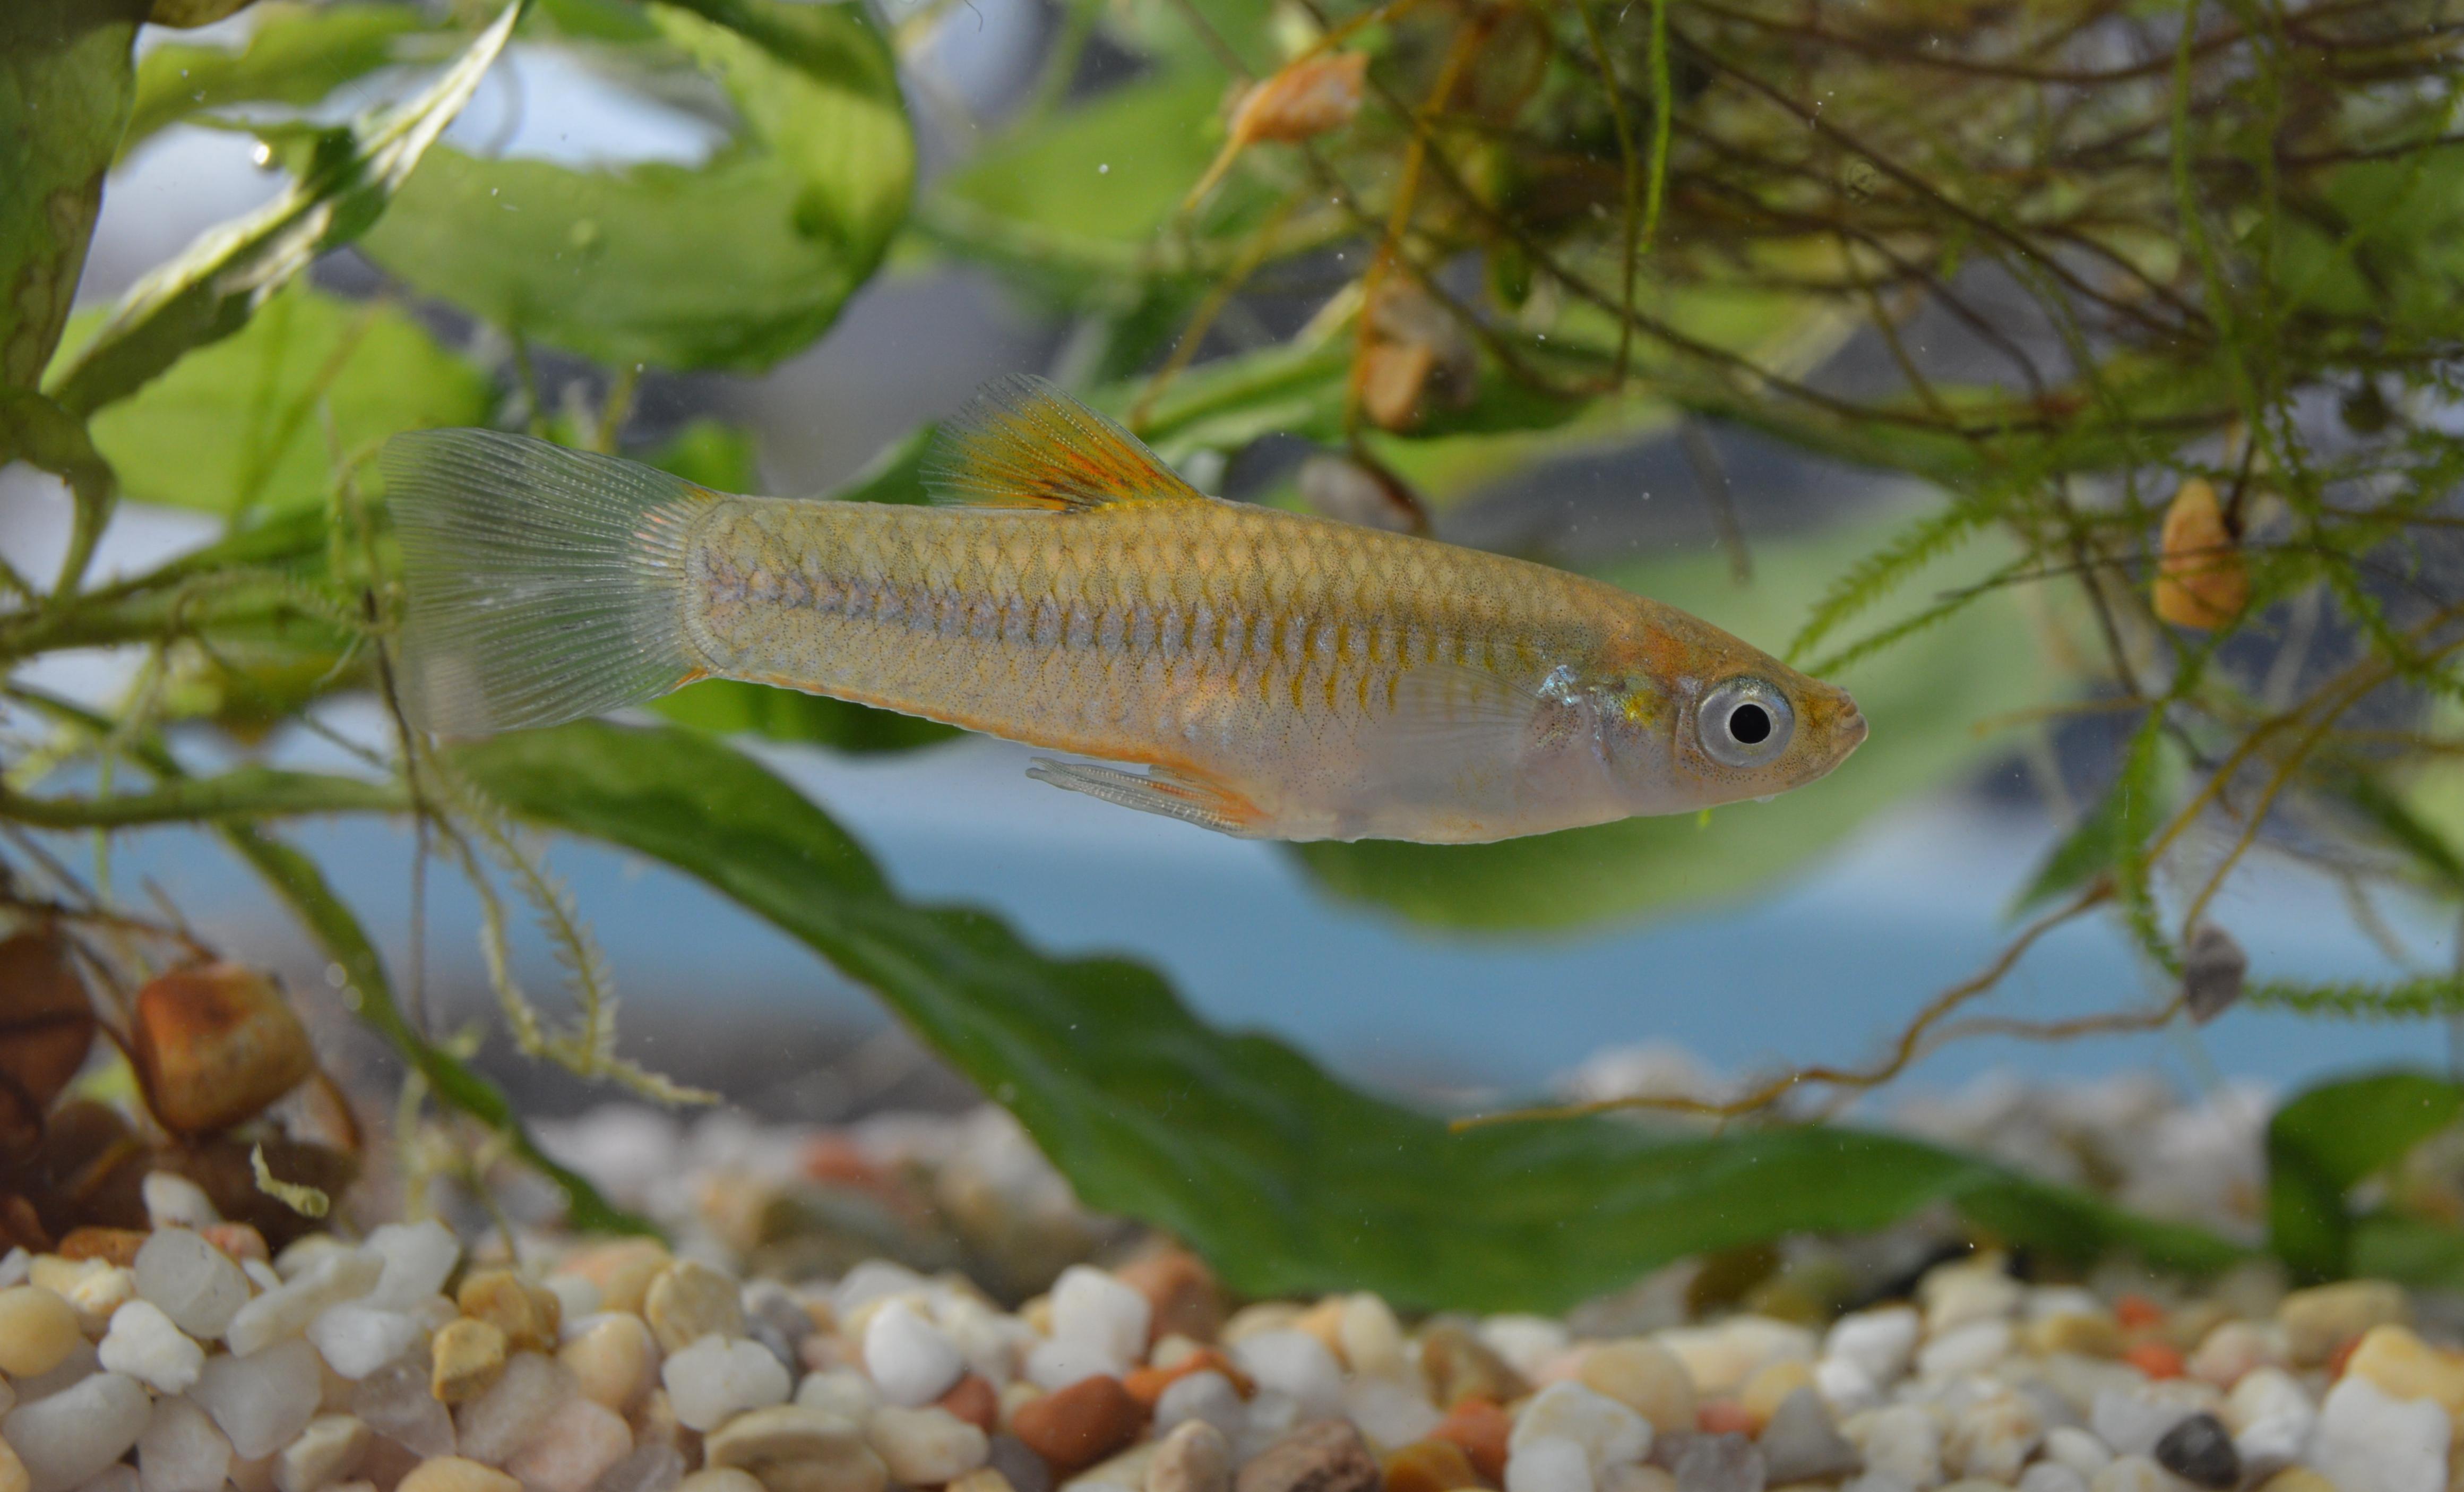 L. versicolor